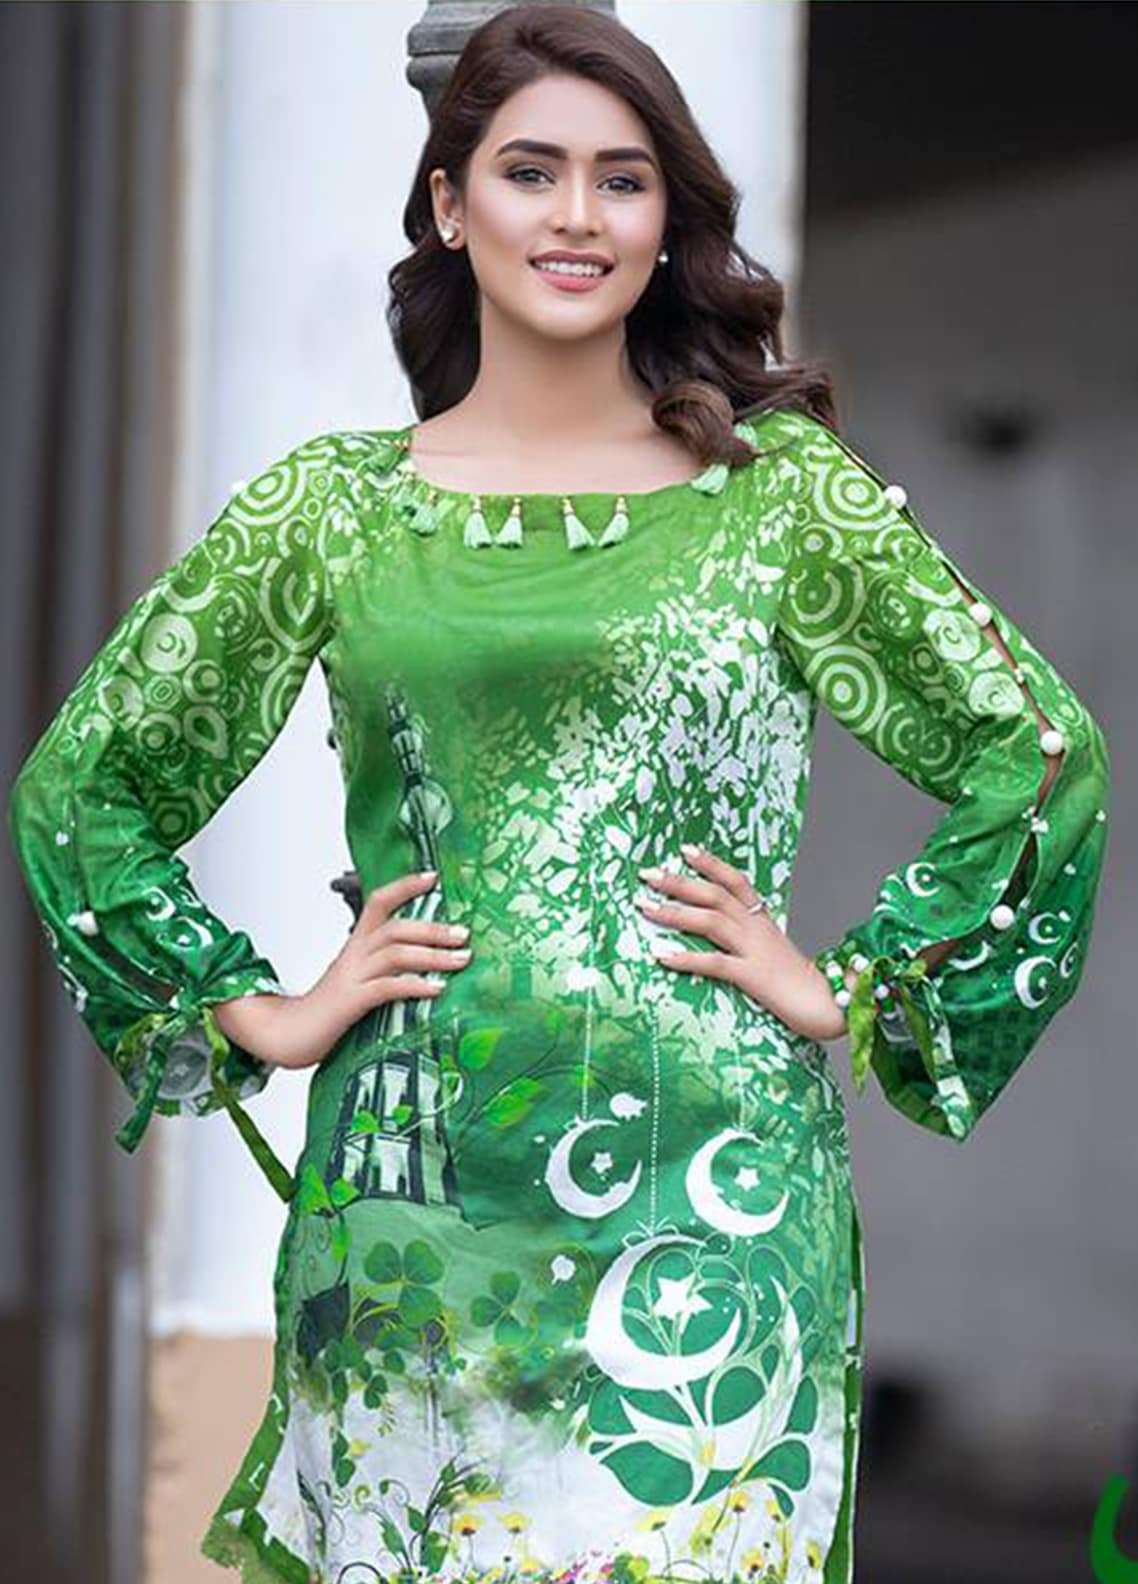 Al Zohaib Printed Cotton Silk Unstitched Kurties AZ18AK 02 - Independence Outfit